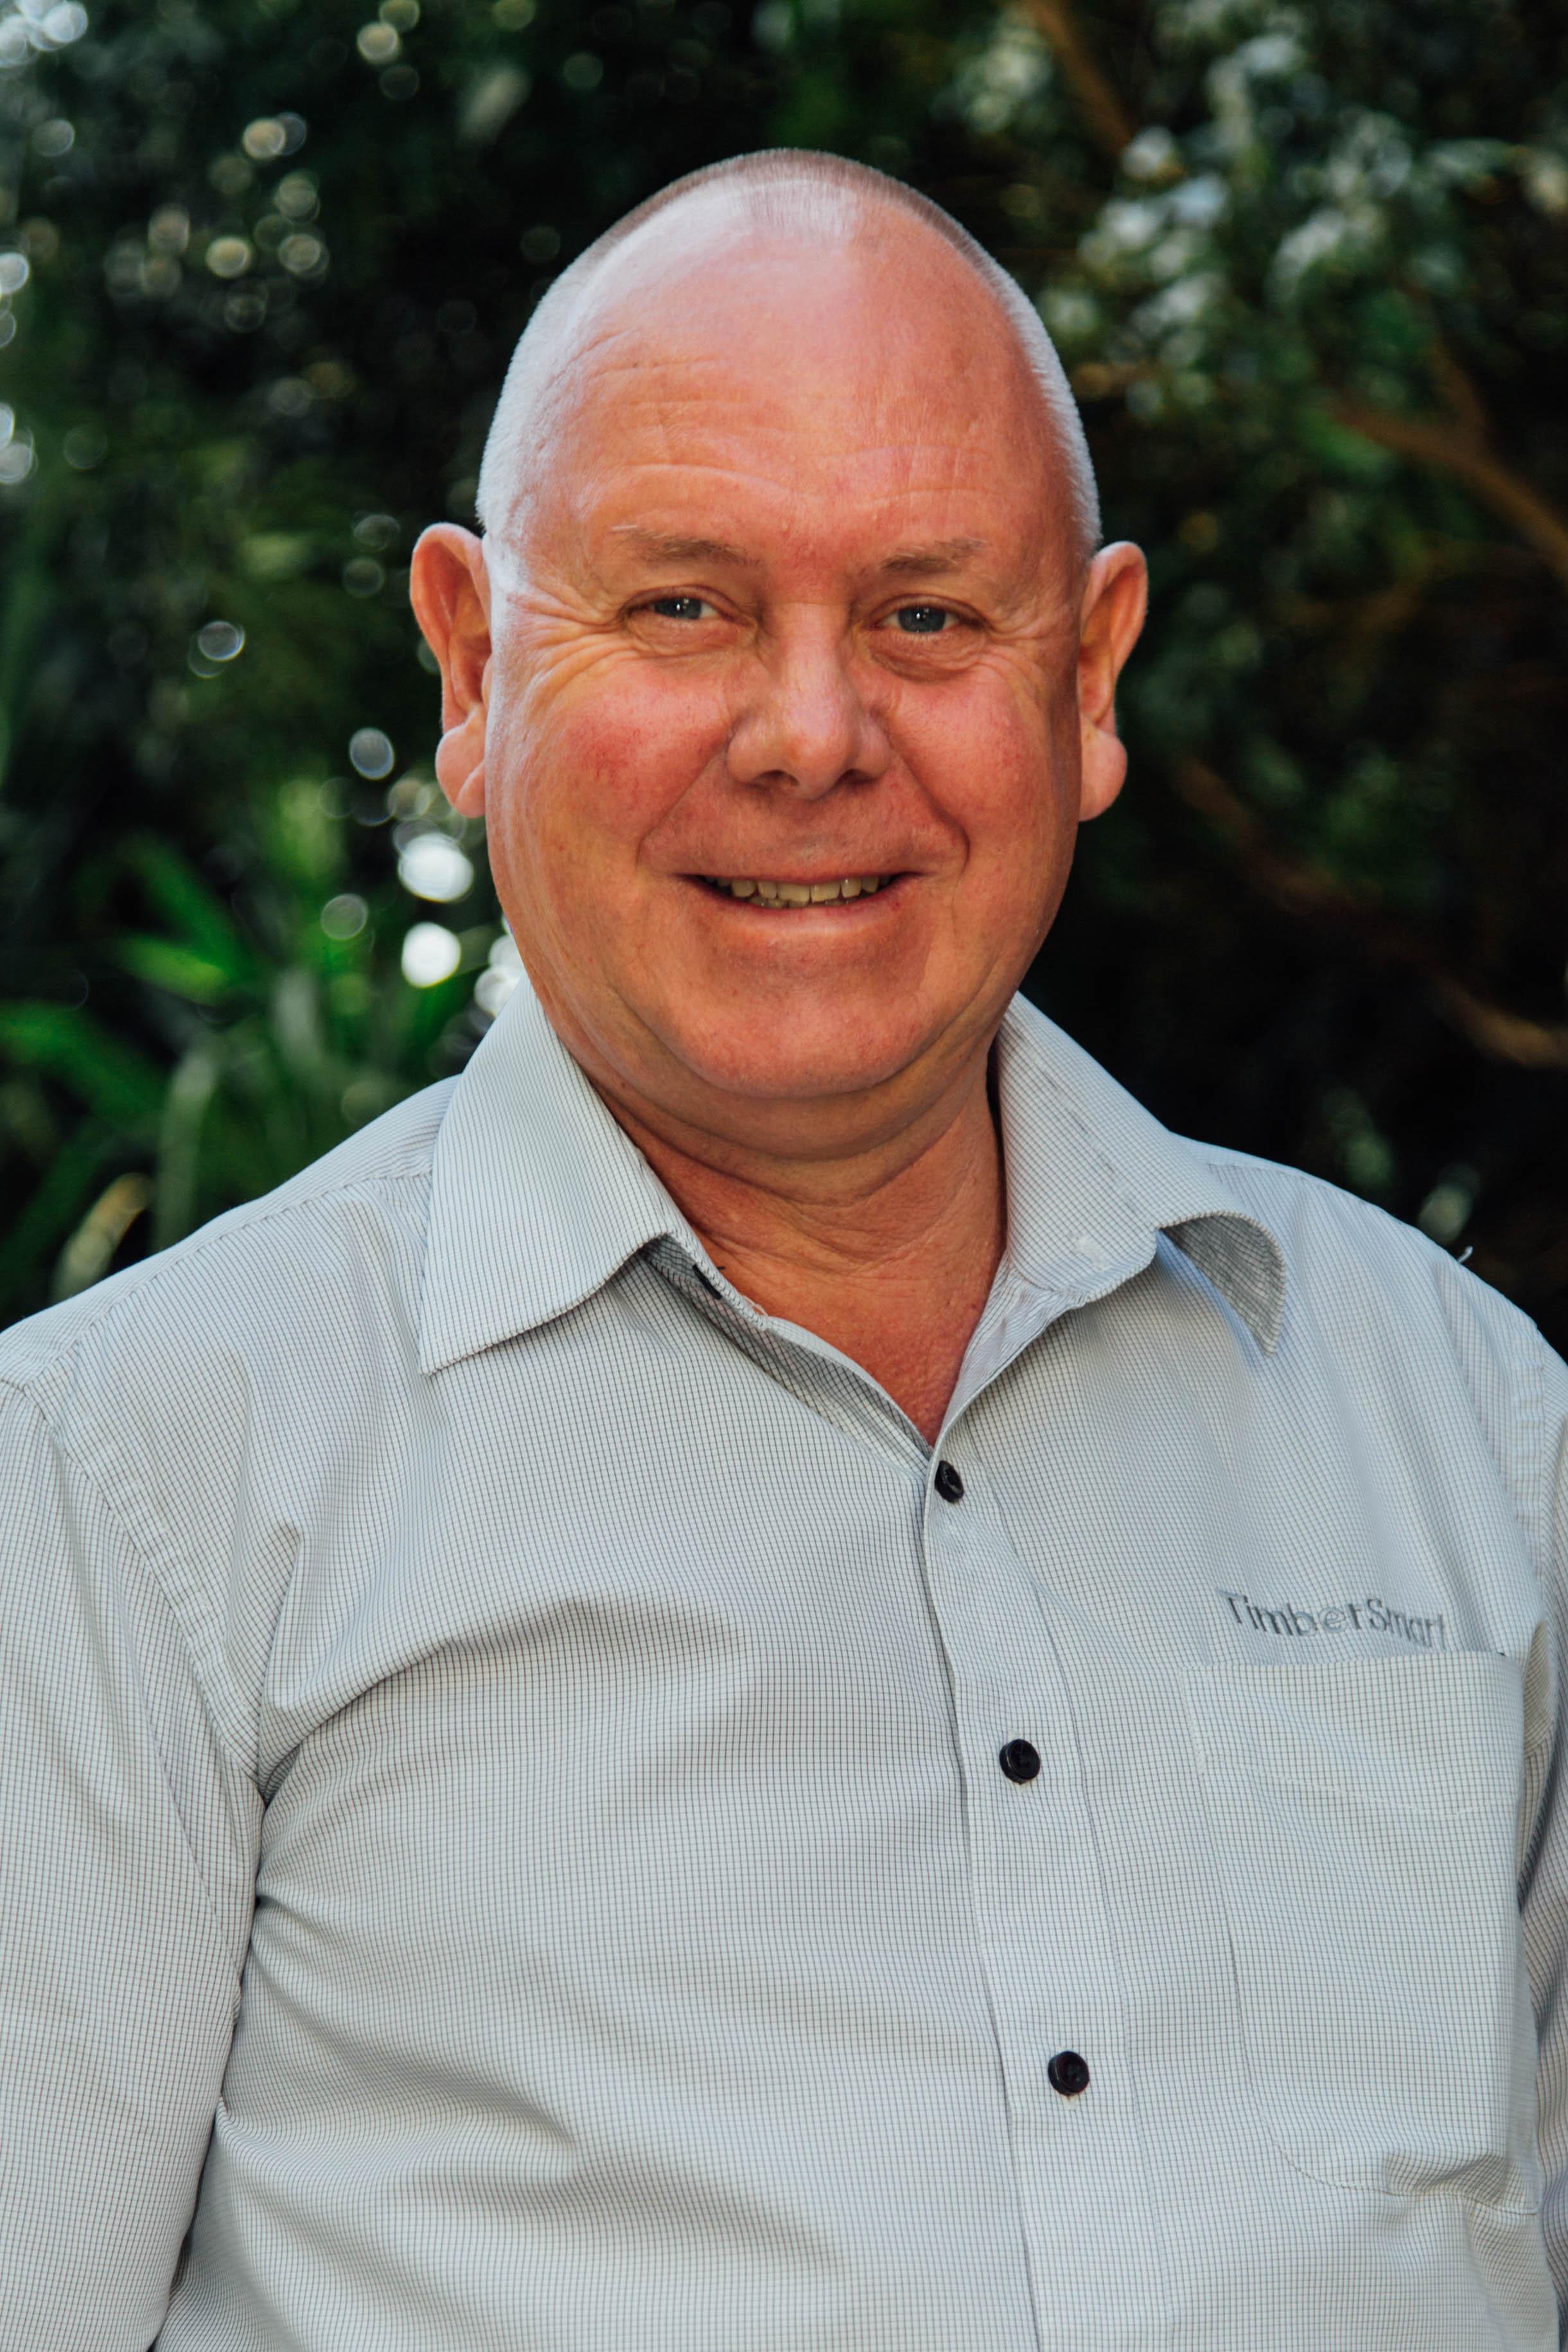 Chris Moysey - Managing Director